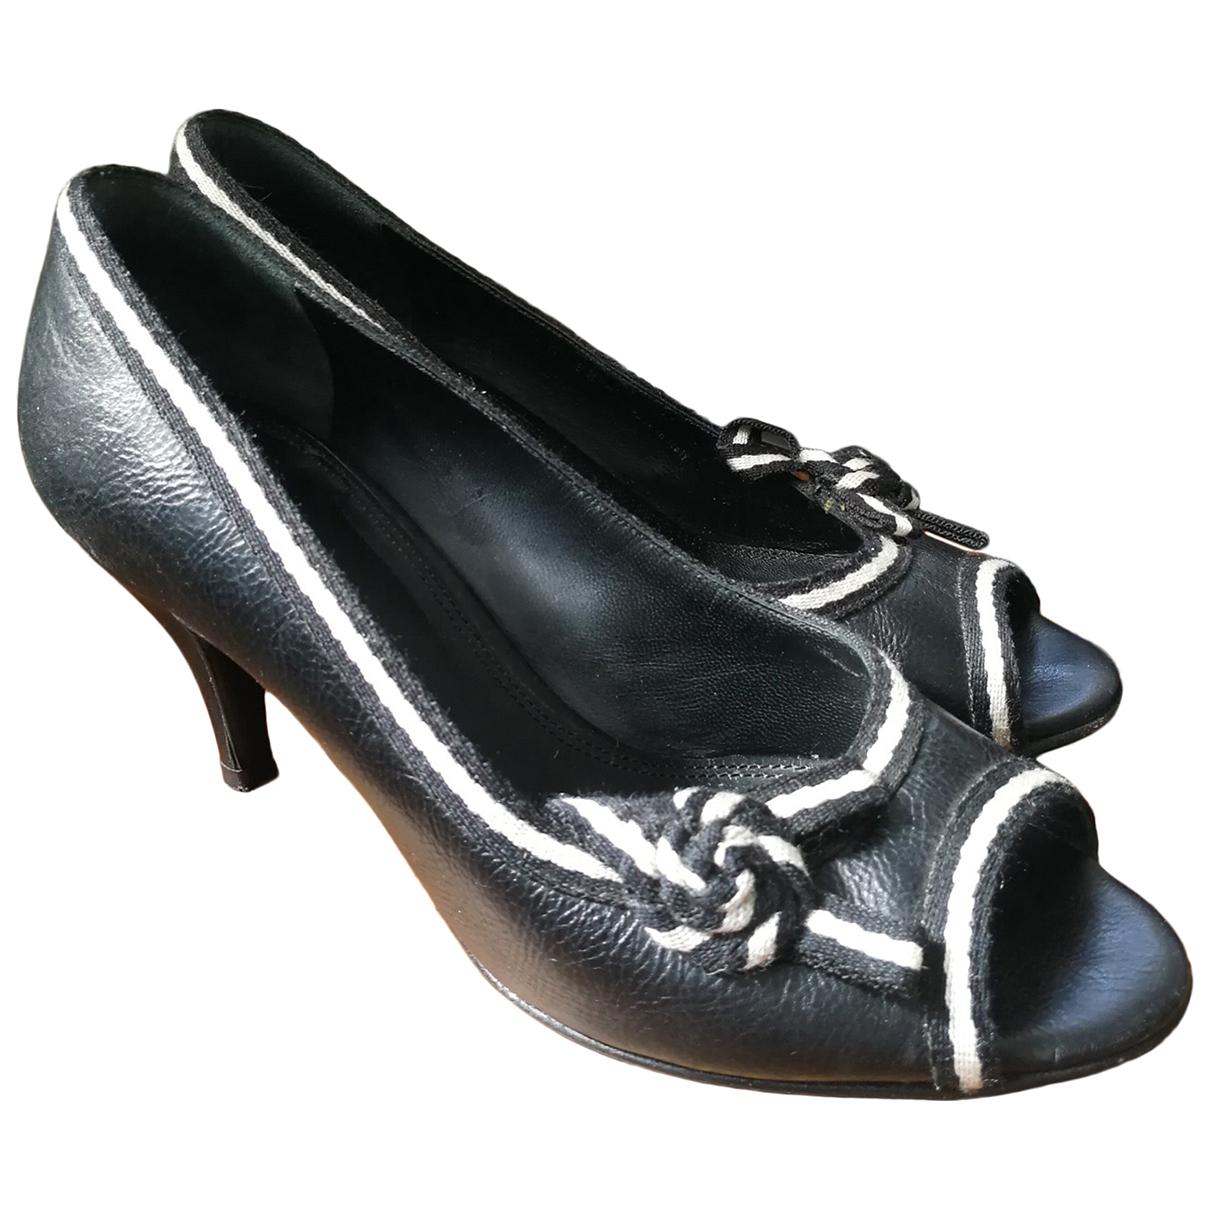 Bally \N Black Leather Heels for Women 36 EU